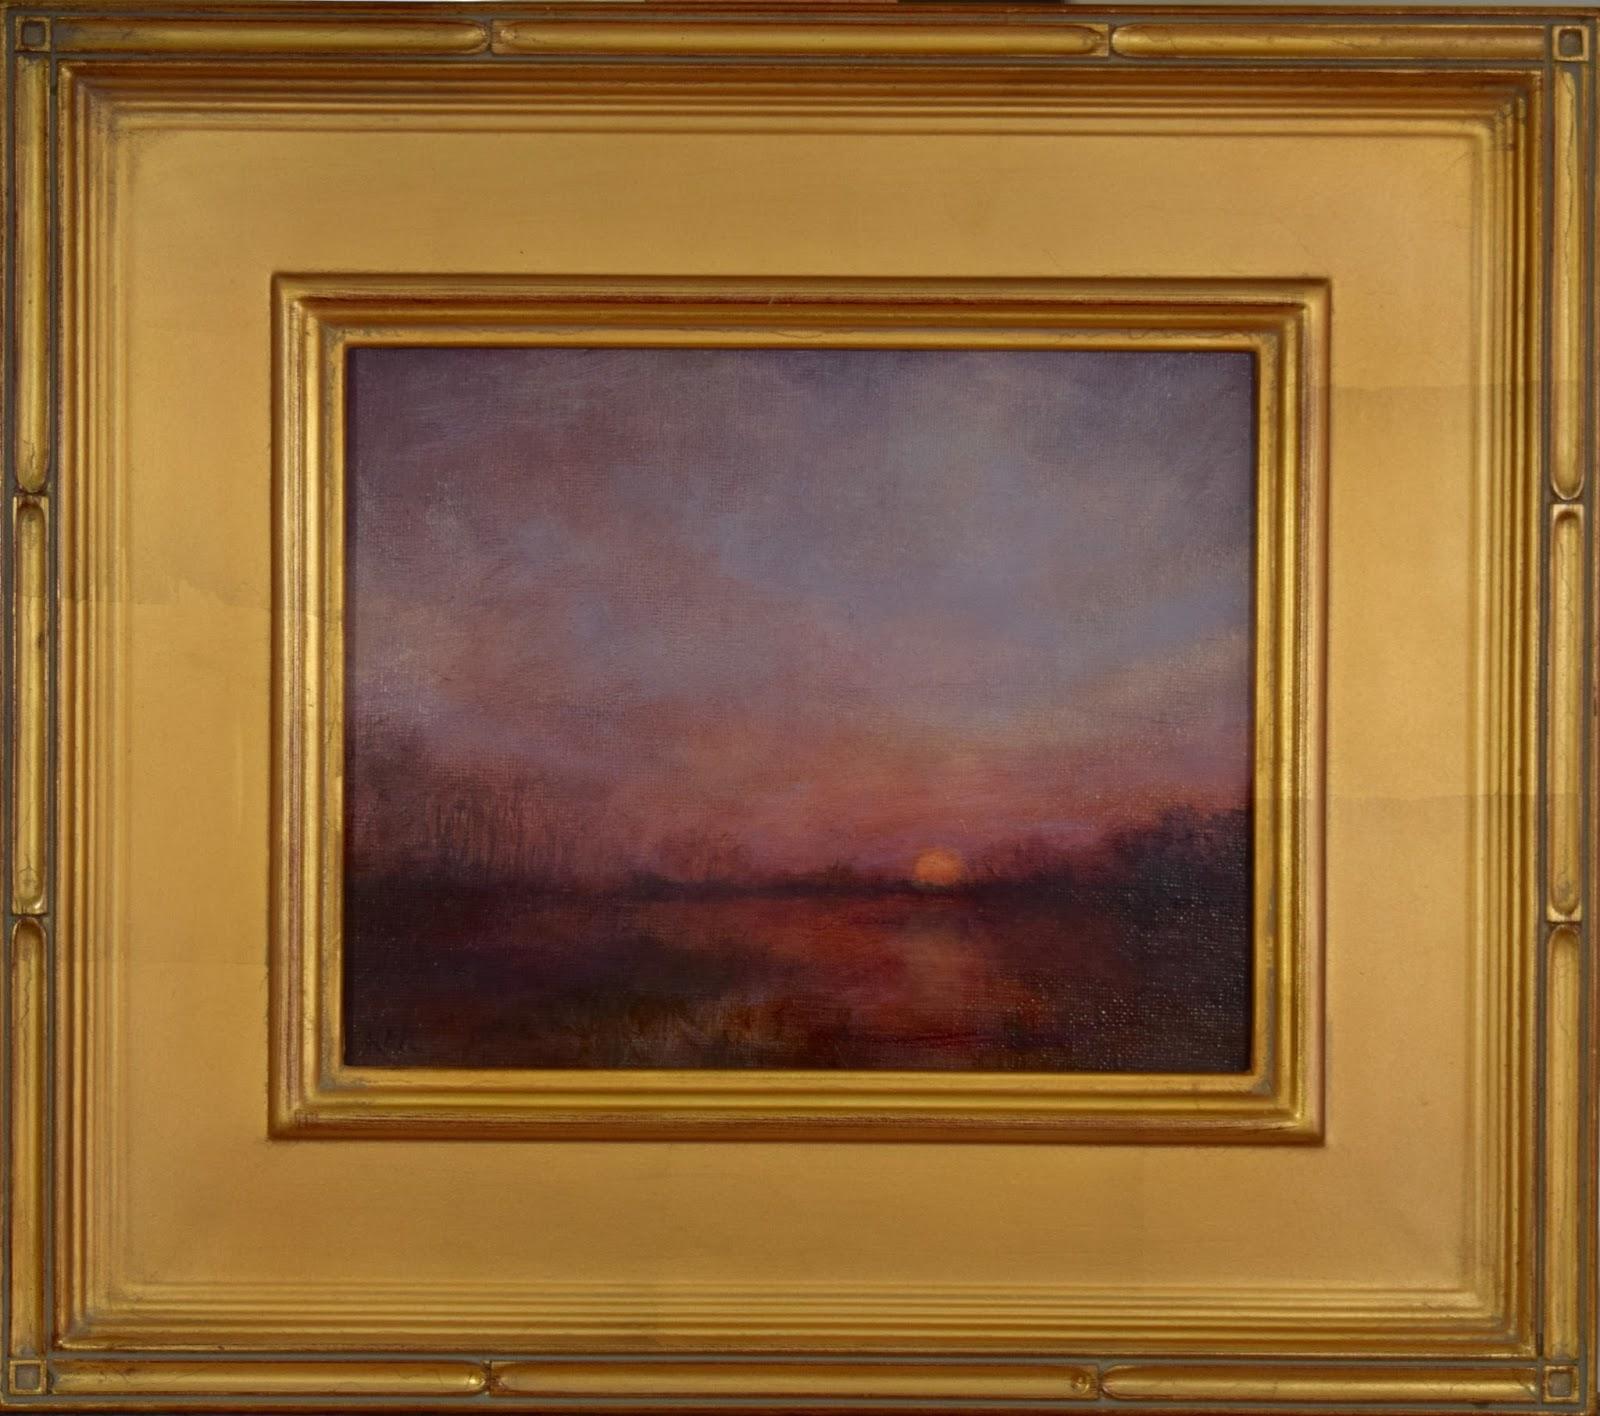 Karen F. Rose ~ My Painting Journey: Karen F. Rose Artist at Ponte ...